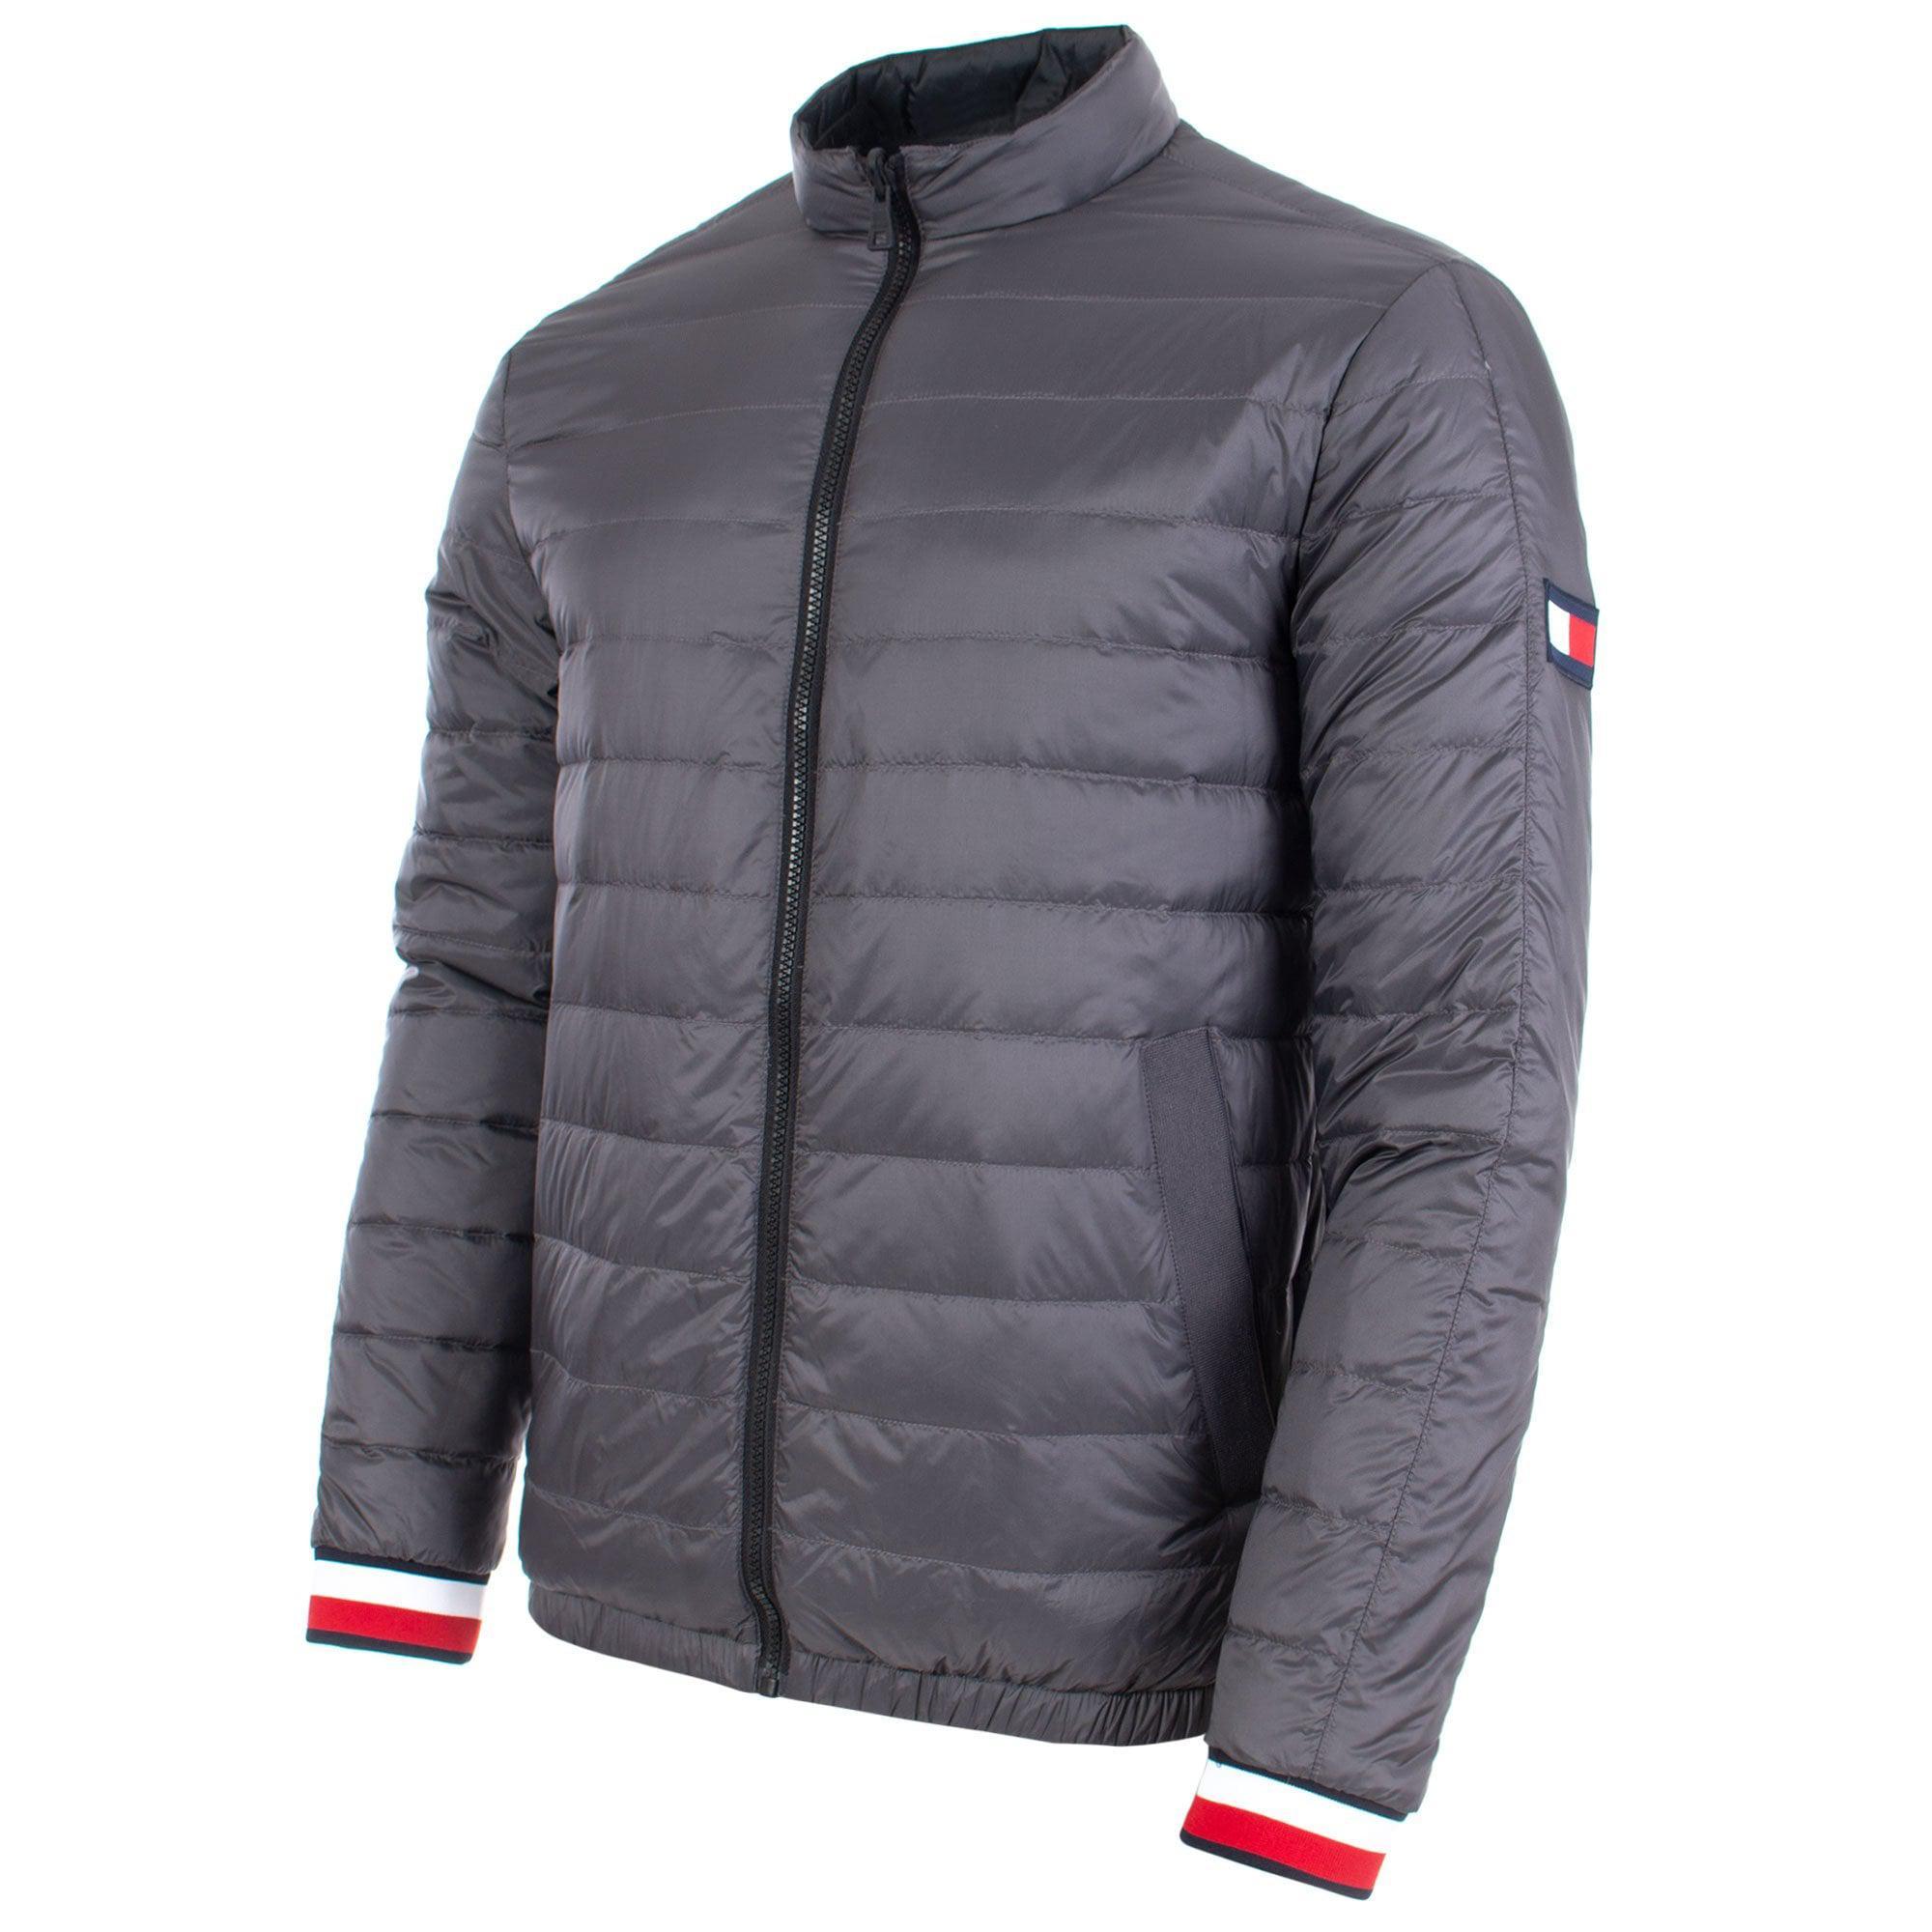 71164e4c1 Tommy Hilfiger Gray Reversible Nylon Down Jacket for men